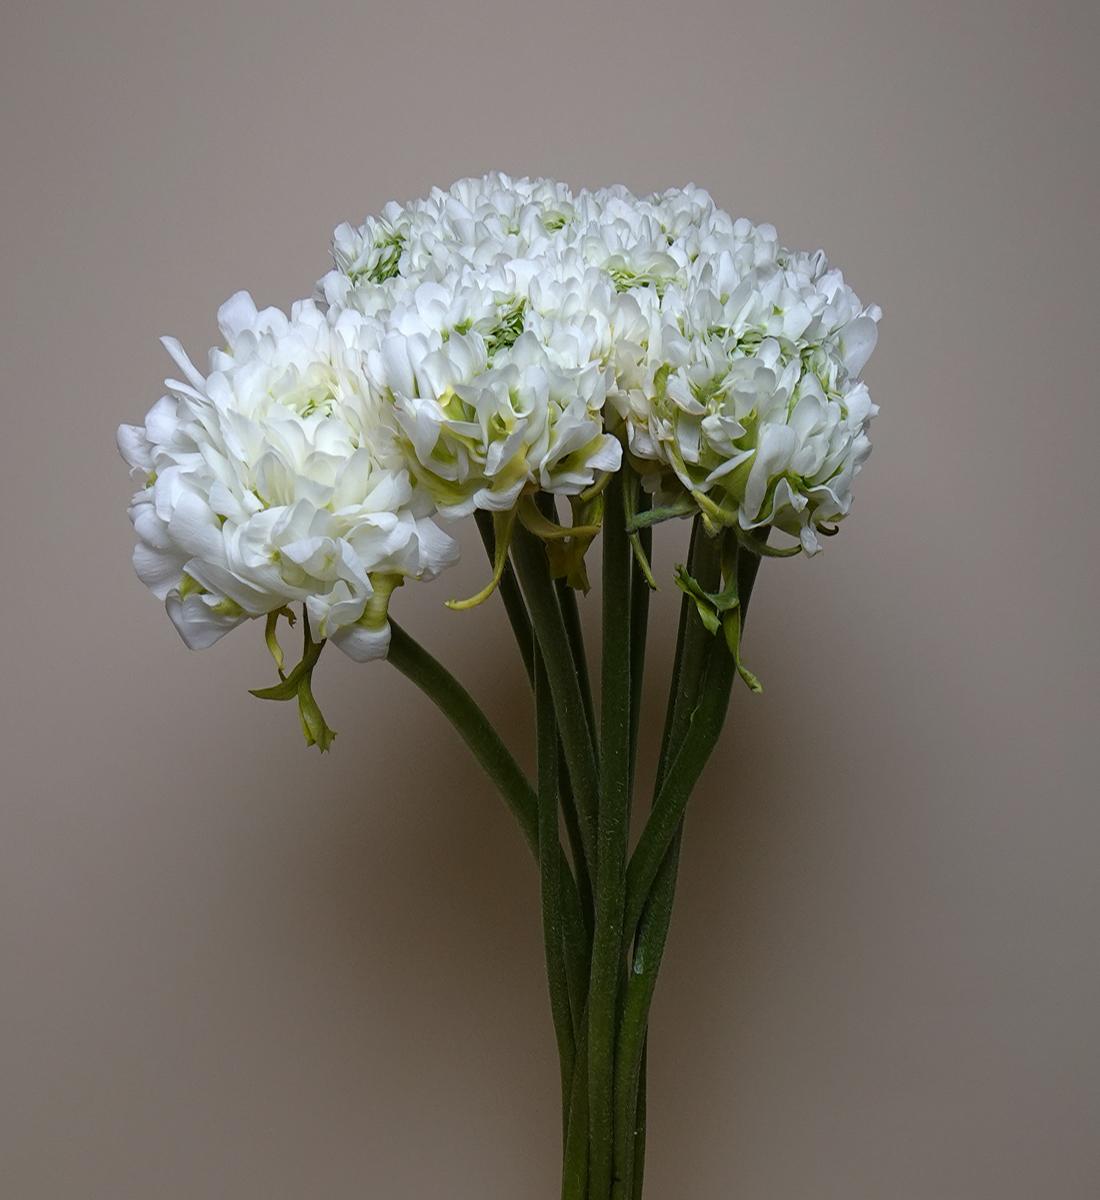 Ranunculus - White & Green Wholesale Flowers